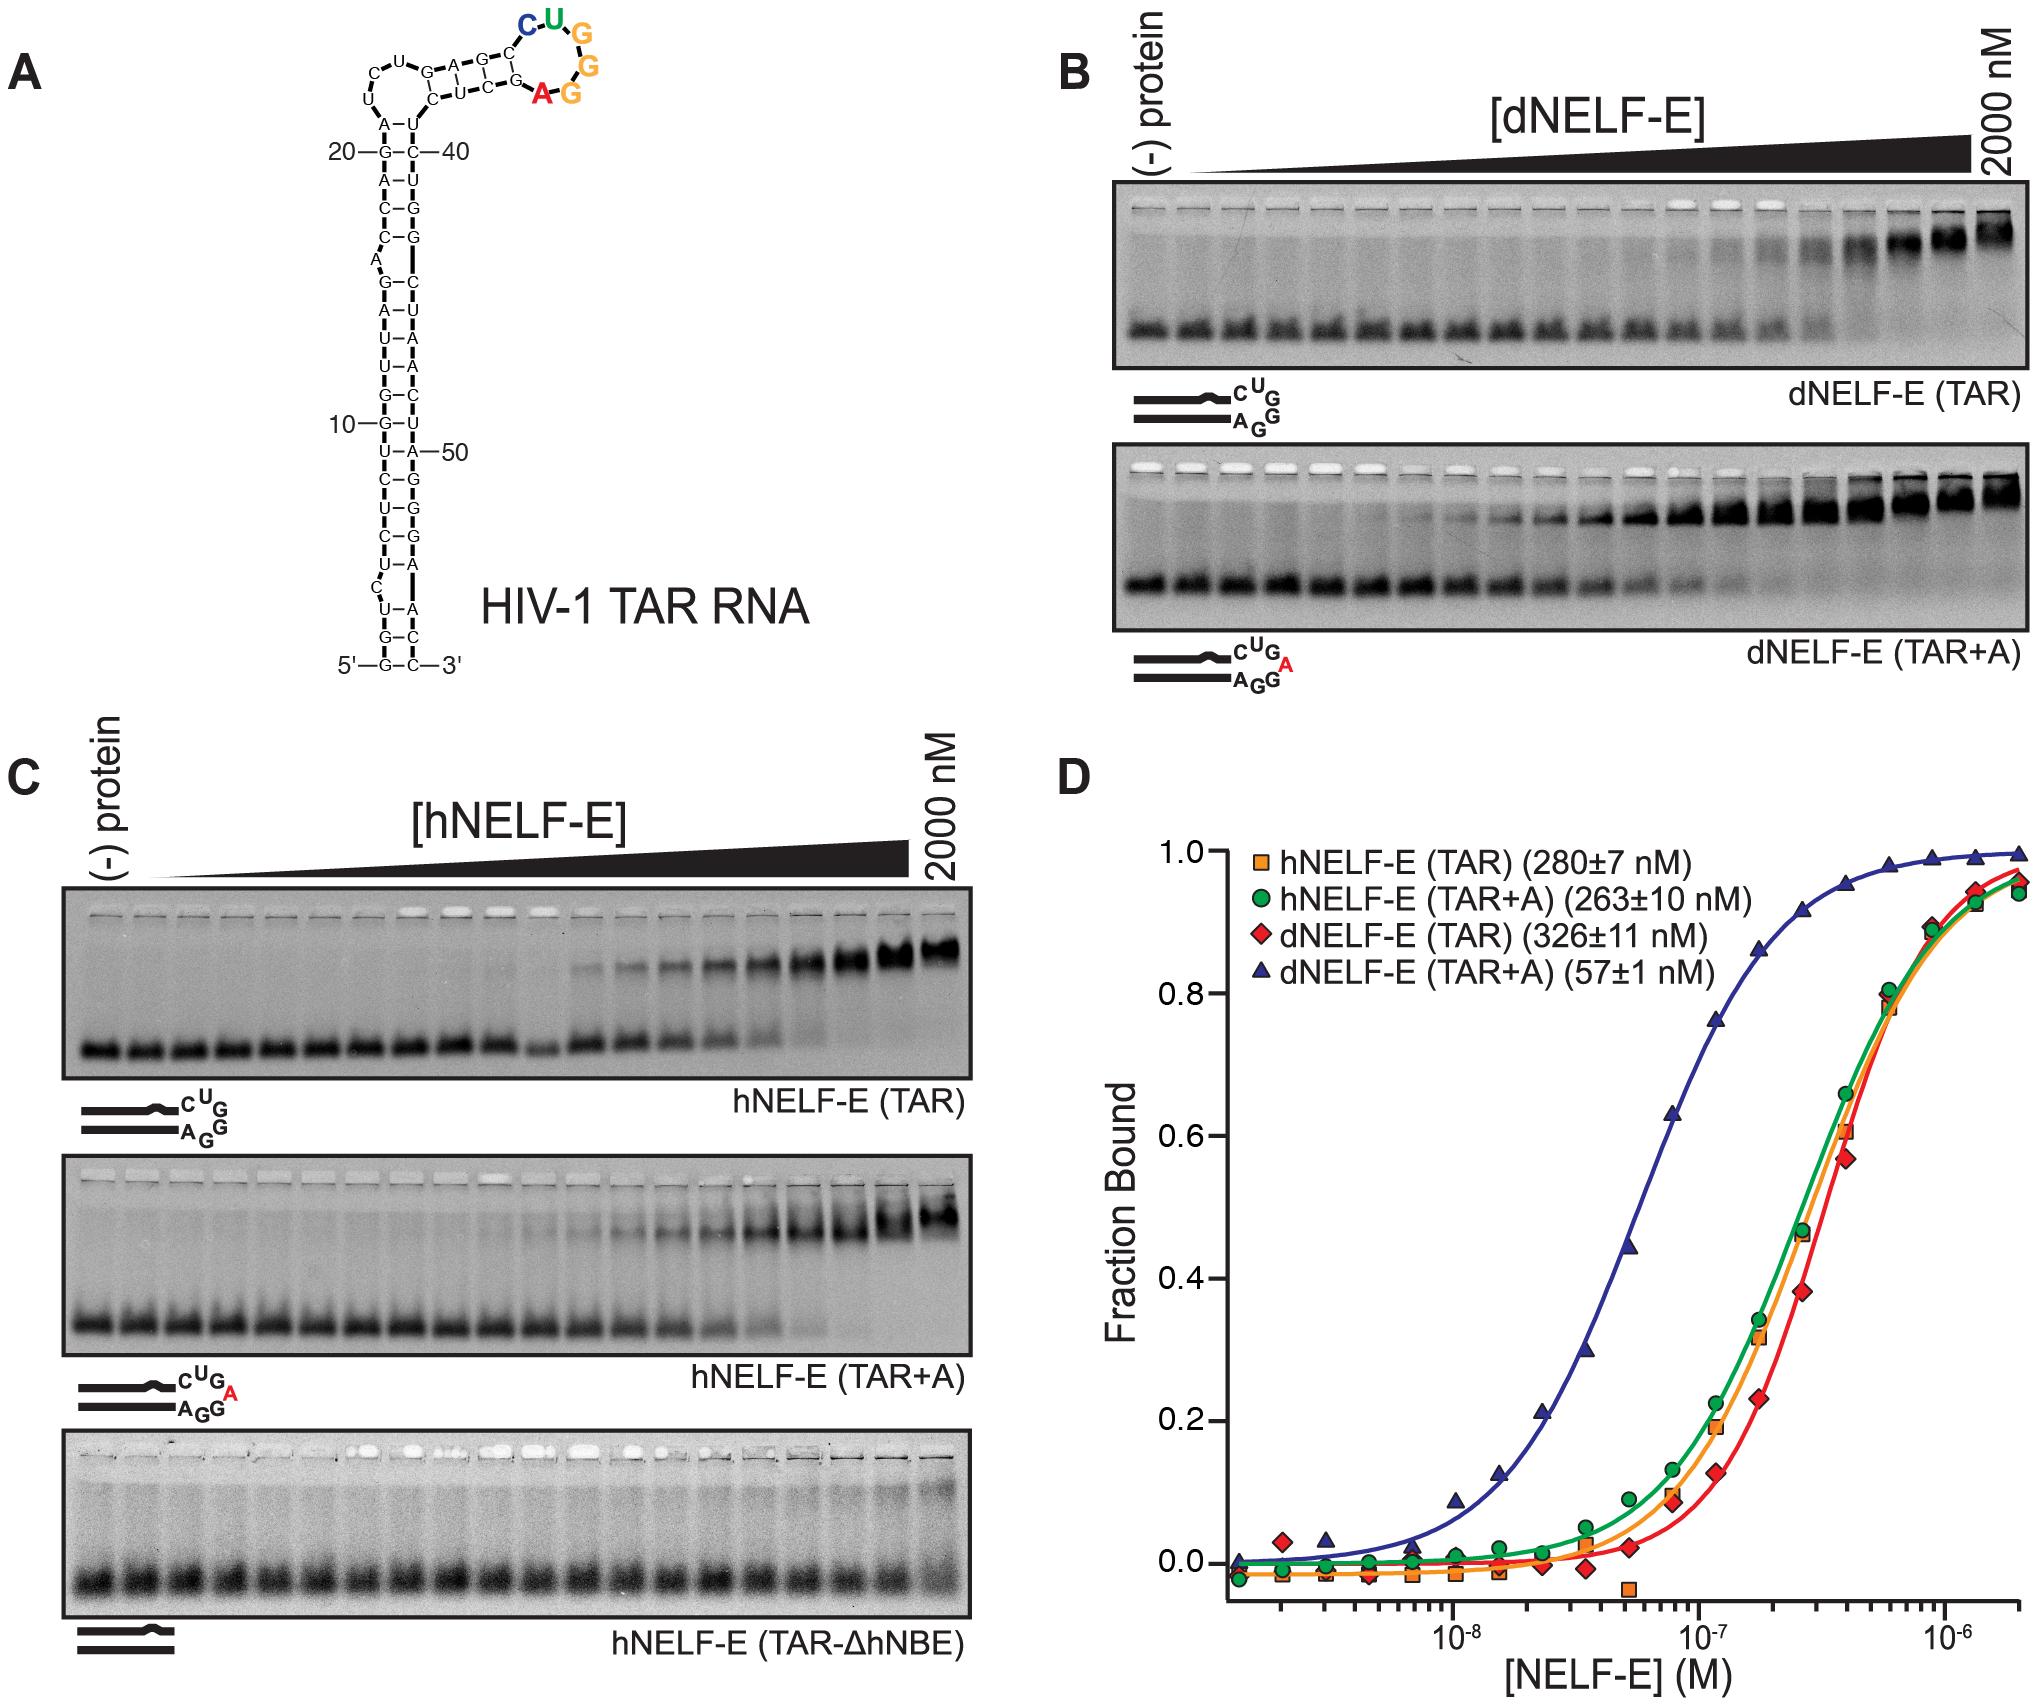 Human and <i>Drosophila</i> NELF-E bind specifically to HIV-1 TAR RNA.